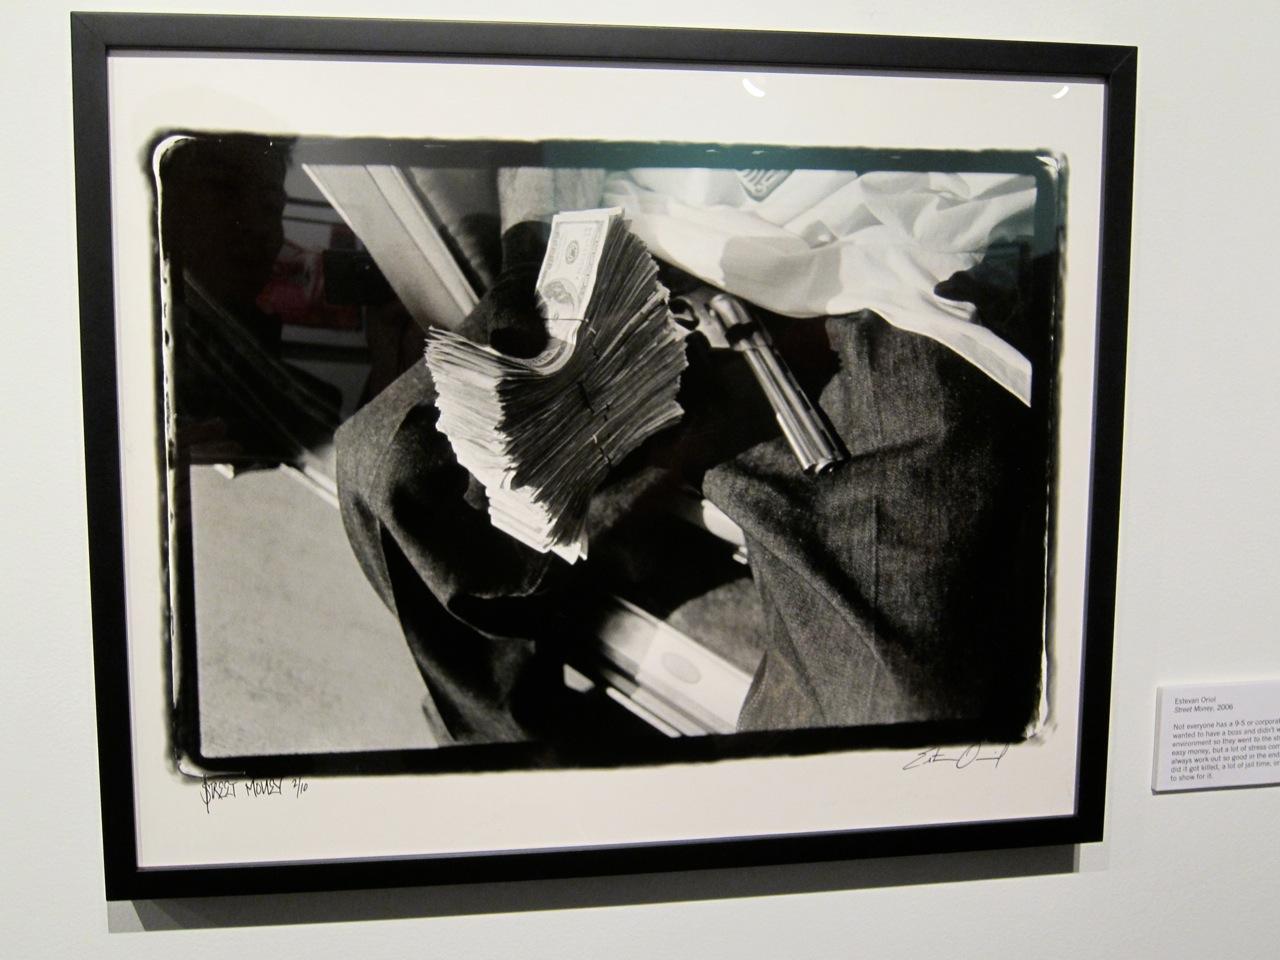 Eriberto Estevan Oriol Carmichael NYC AM 49